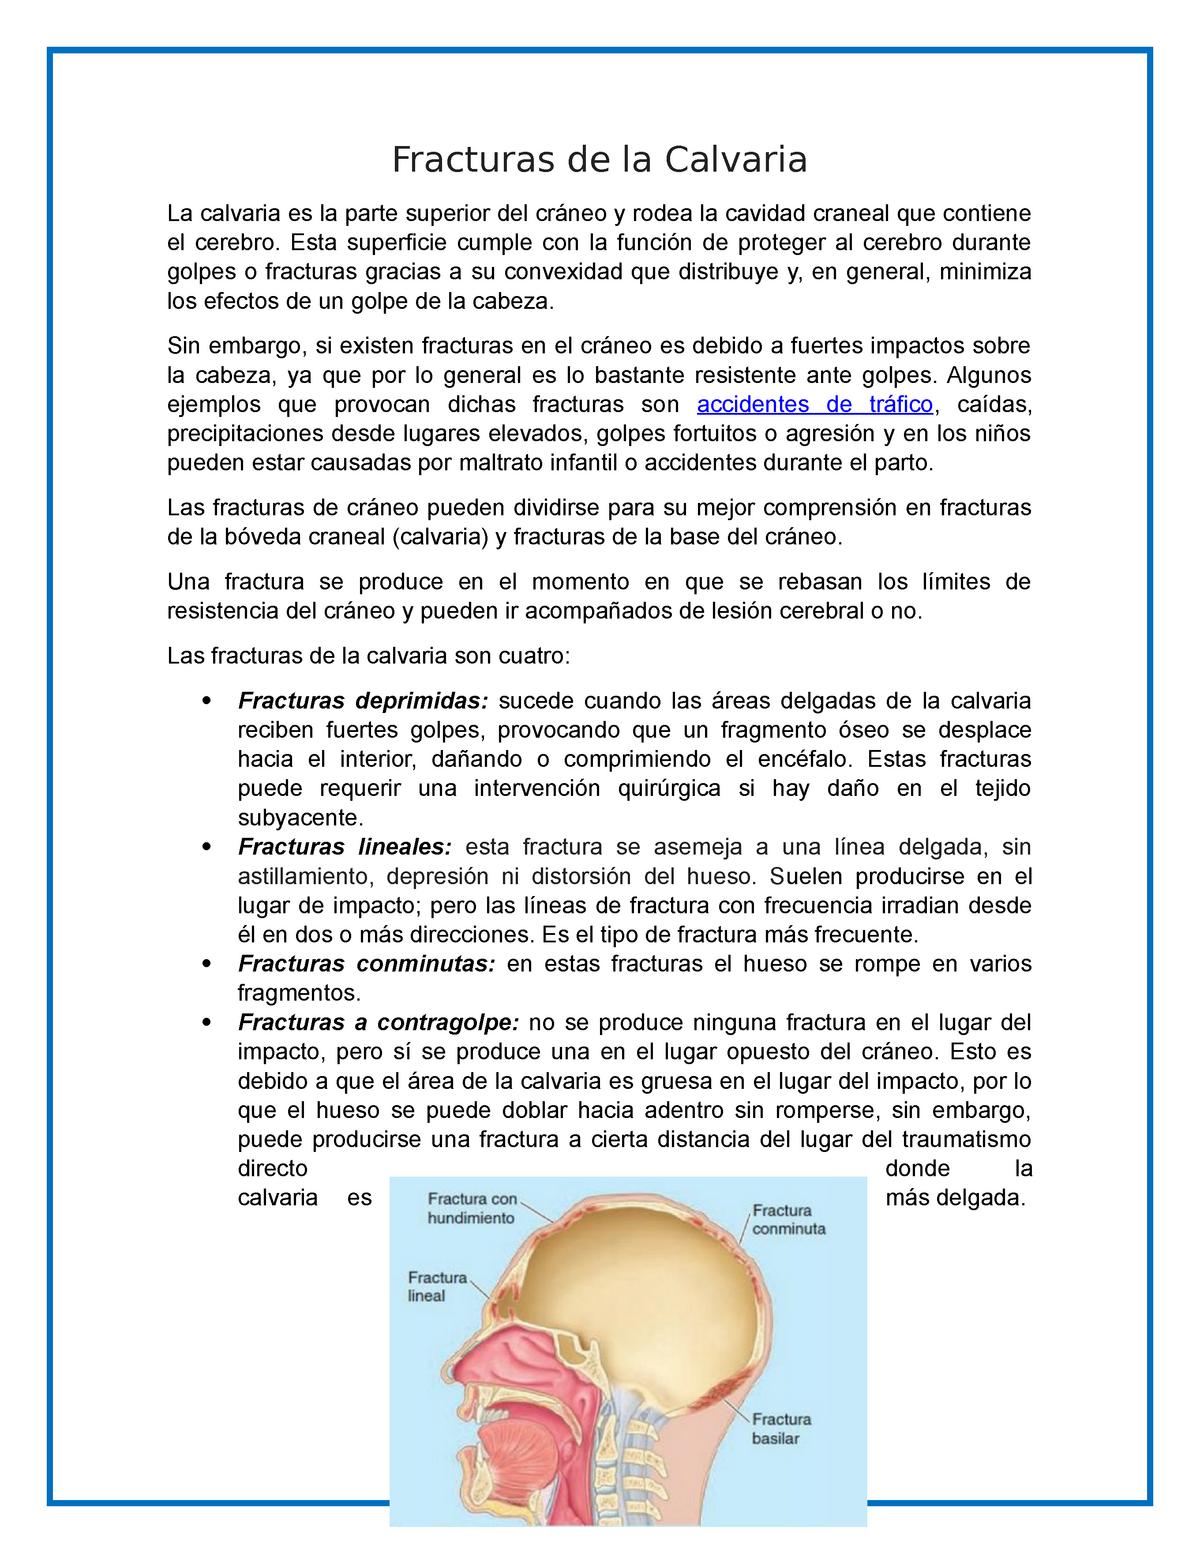 Lesión cerebral fractura de cráneo basilar